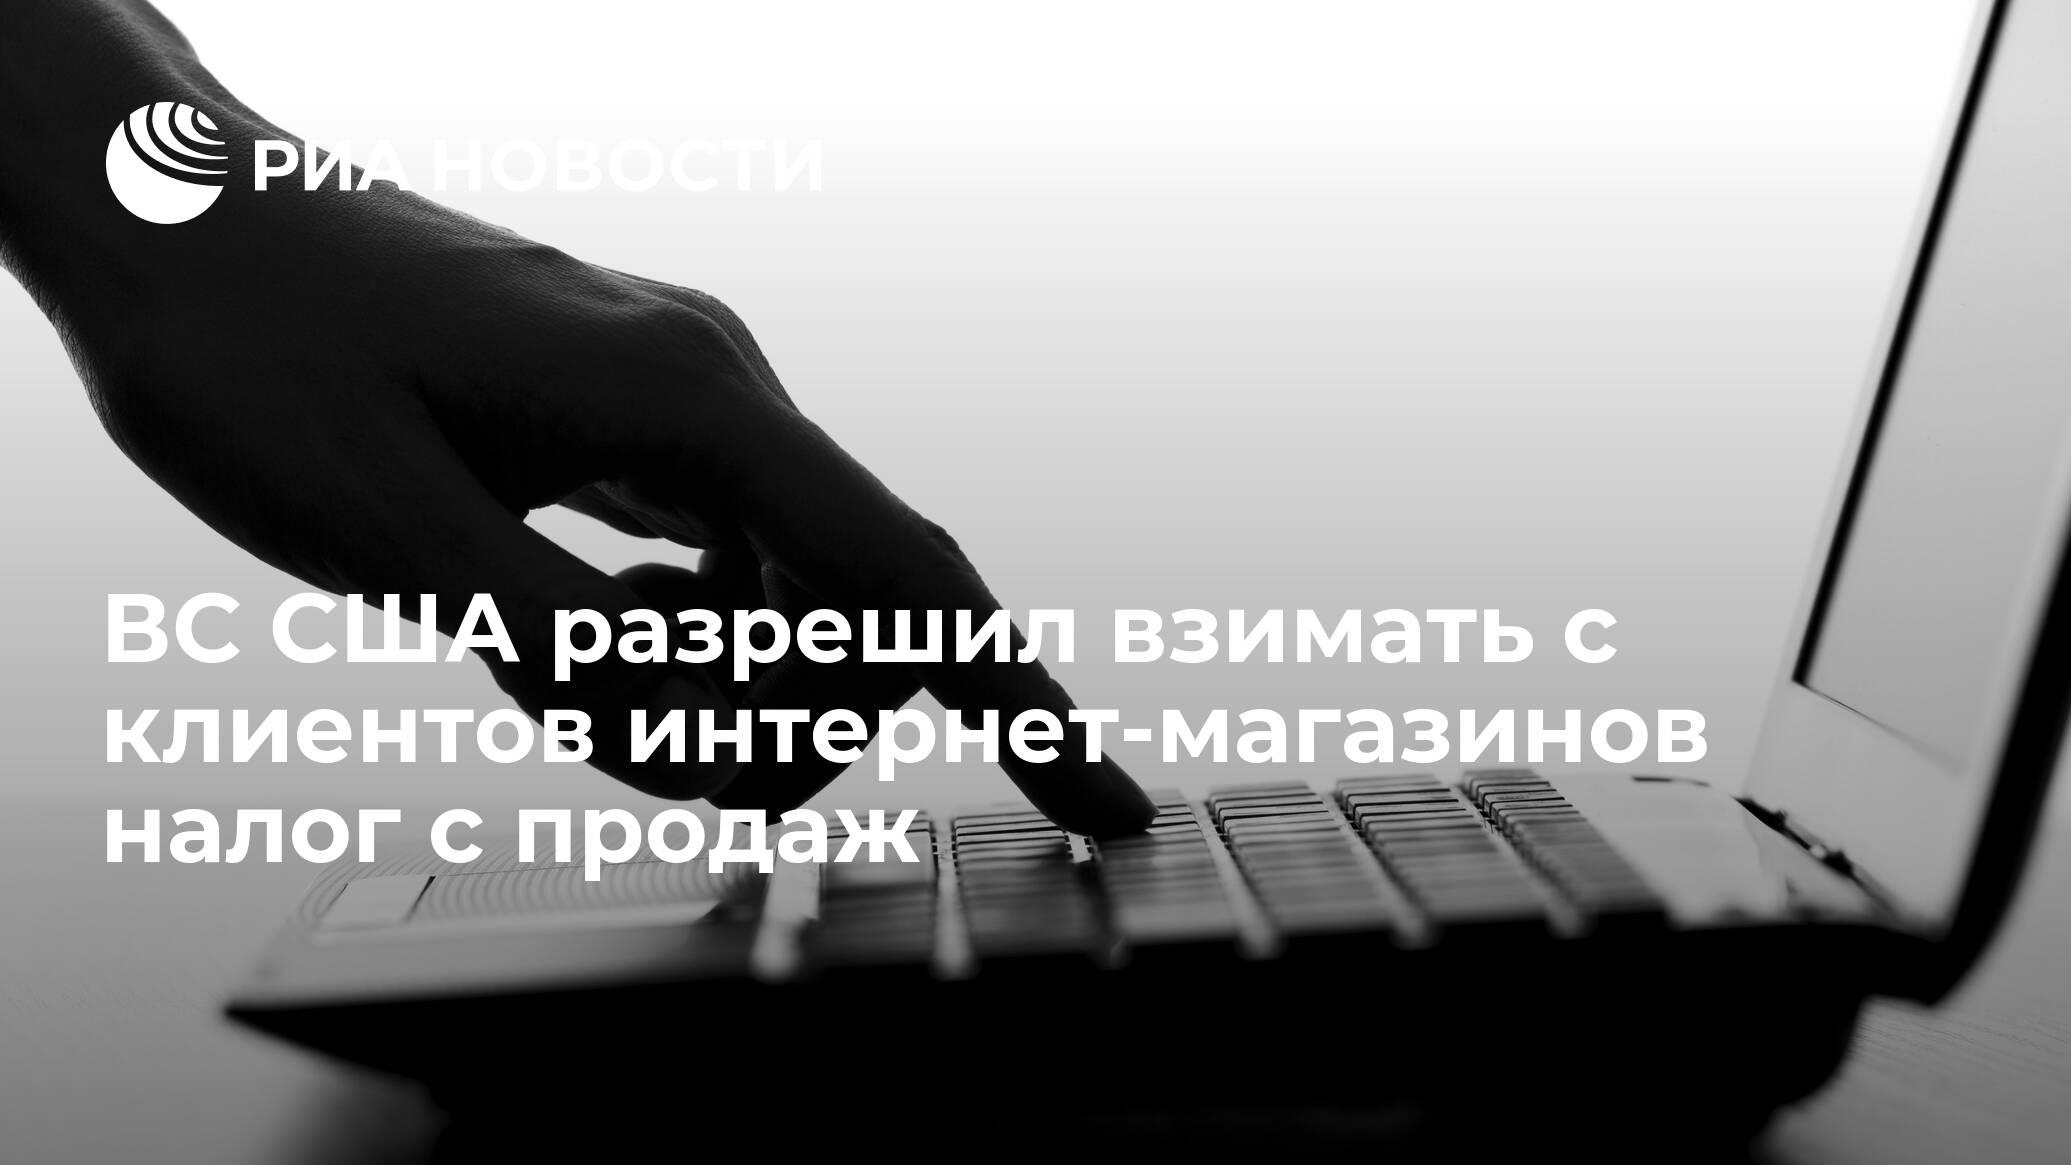 заработок в интернете и налоги украина